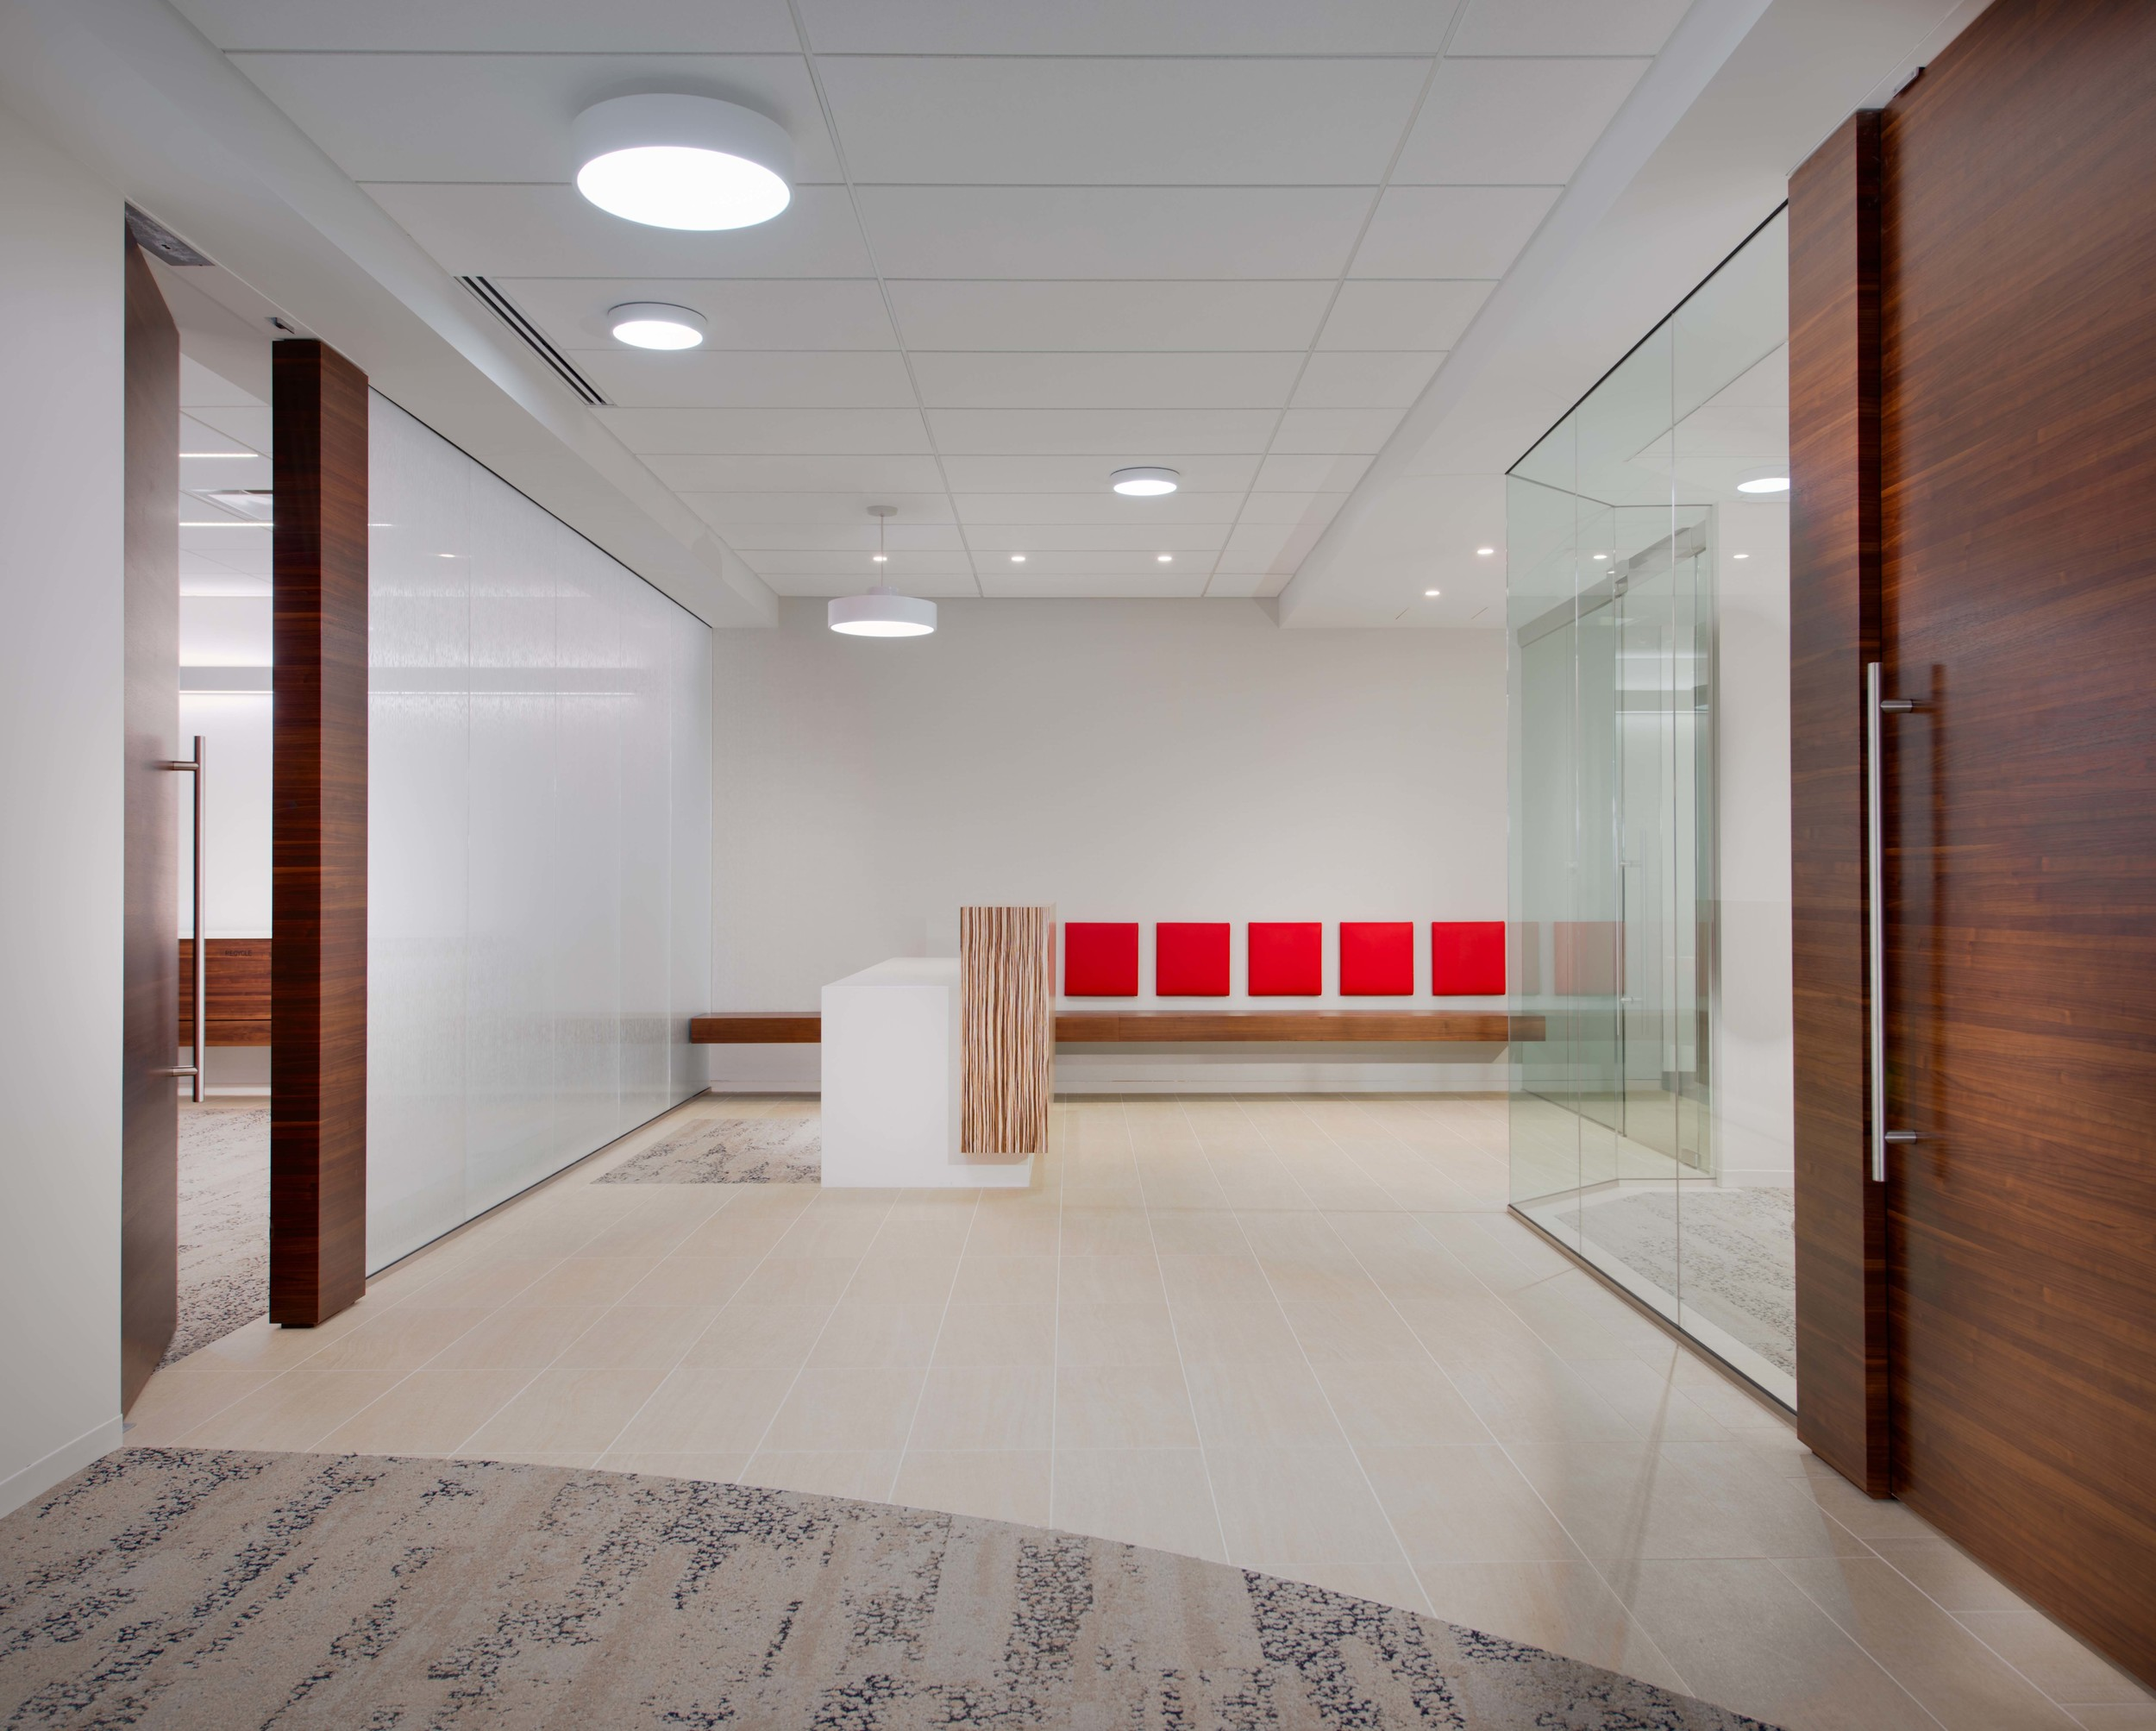 1200 17th Office Suite Interior Image 216463.jpg